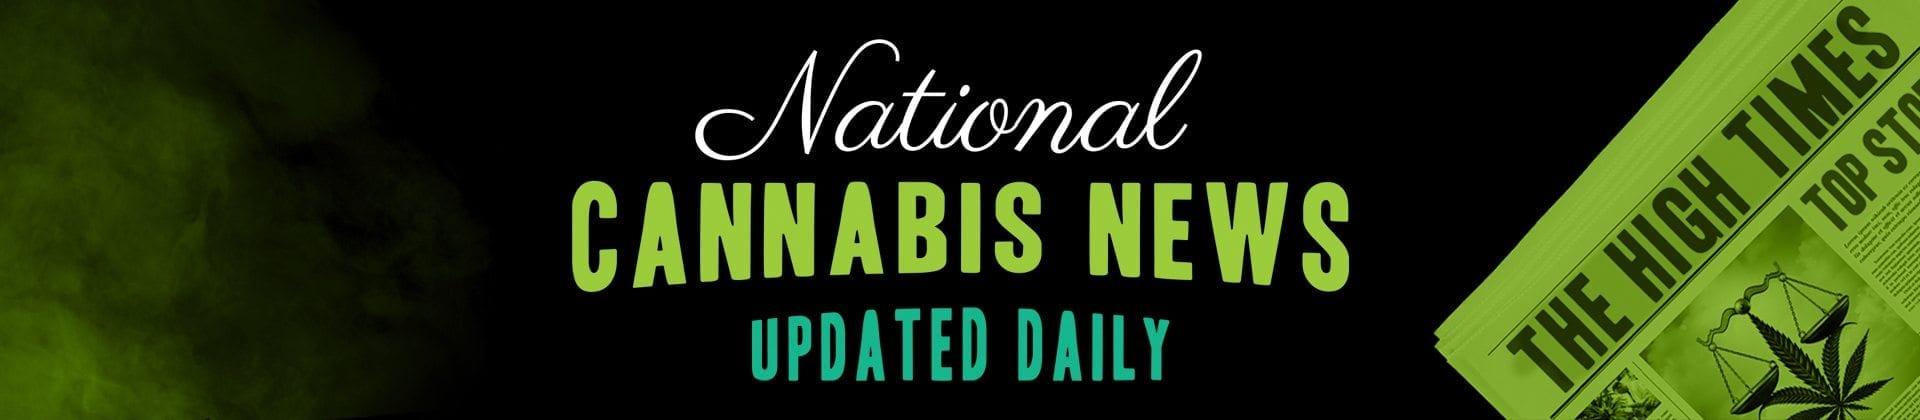 Cannabis-News